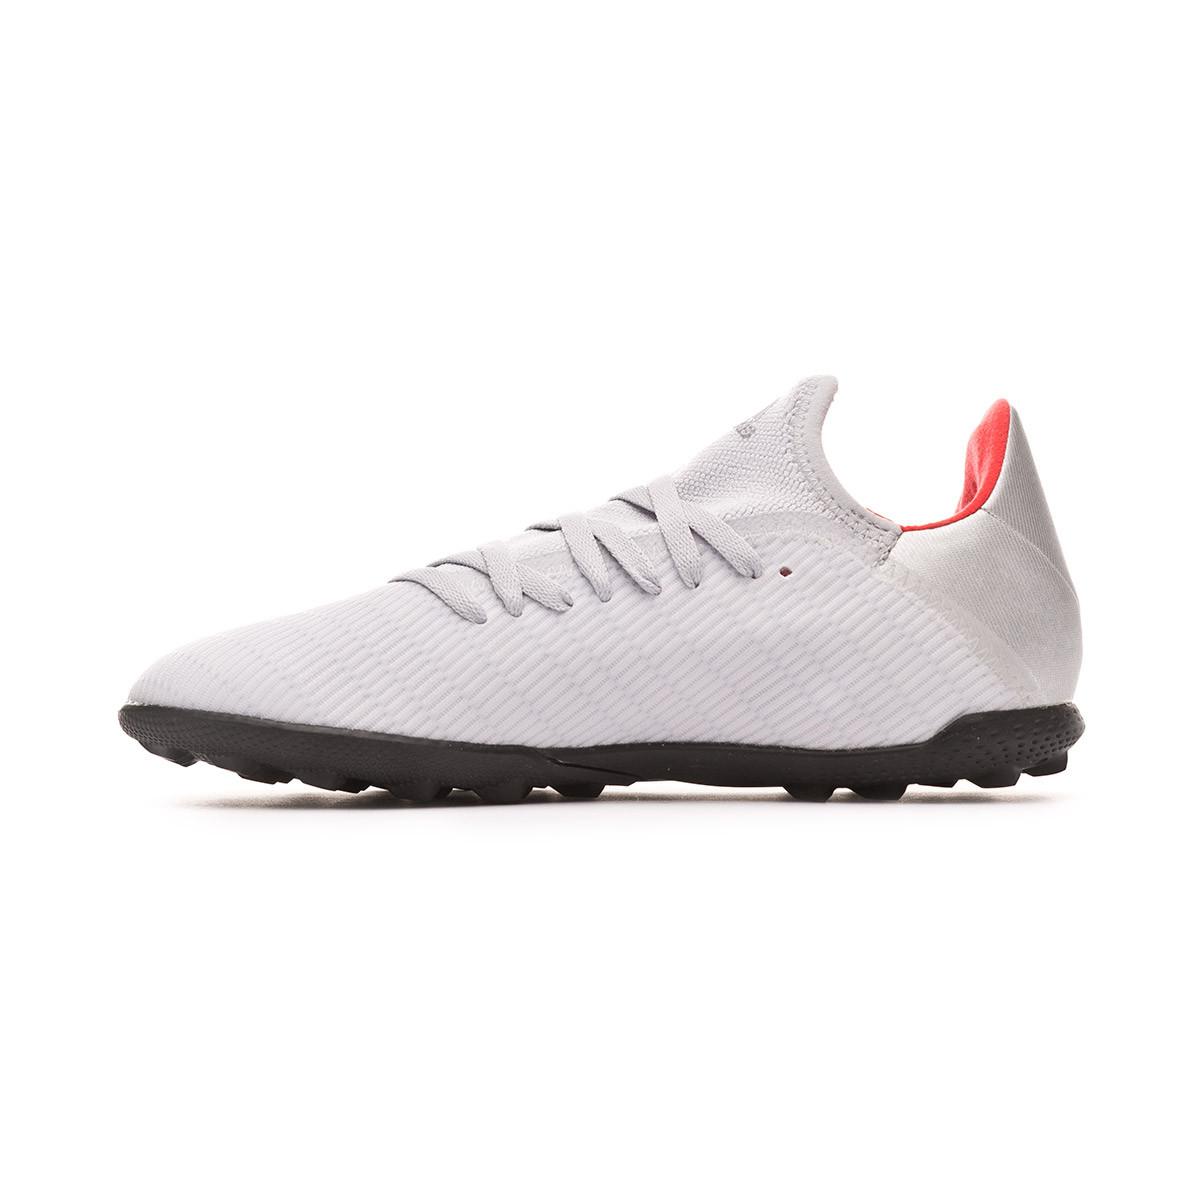 a387e9ce8 Football Boot adidas X 19.3 Turf Niño Silver metallic-Hi red-White -  Football store Fútbol Emotion